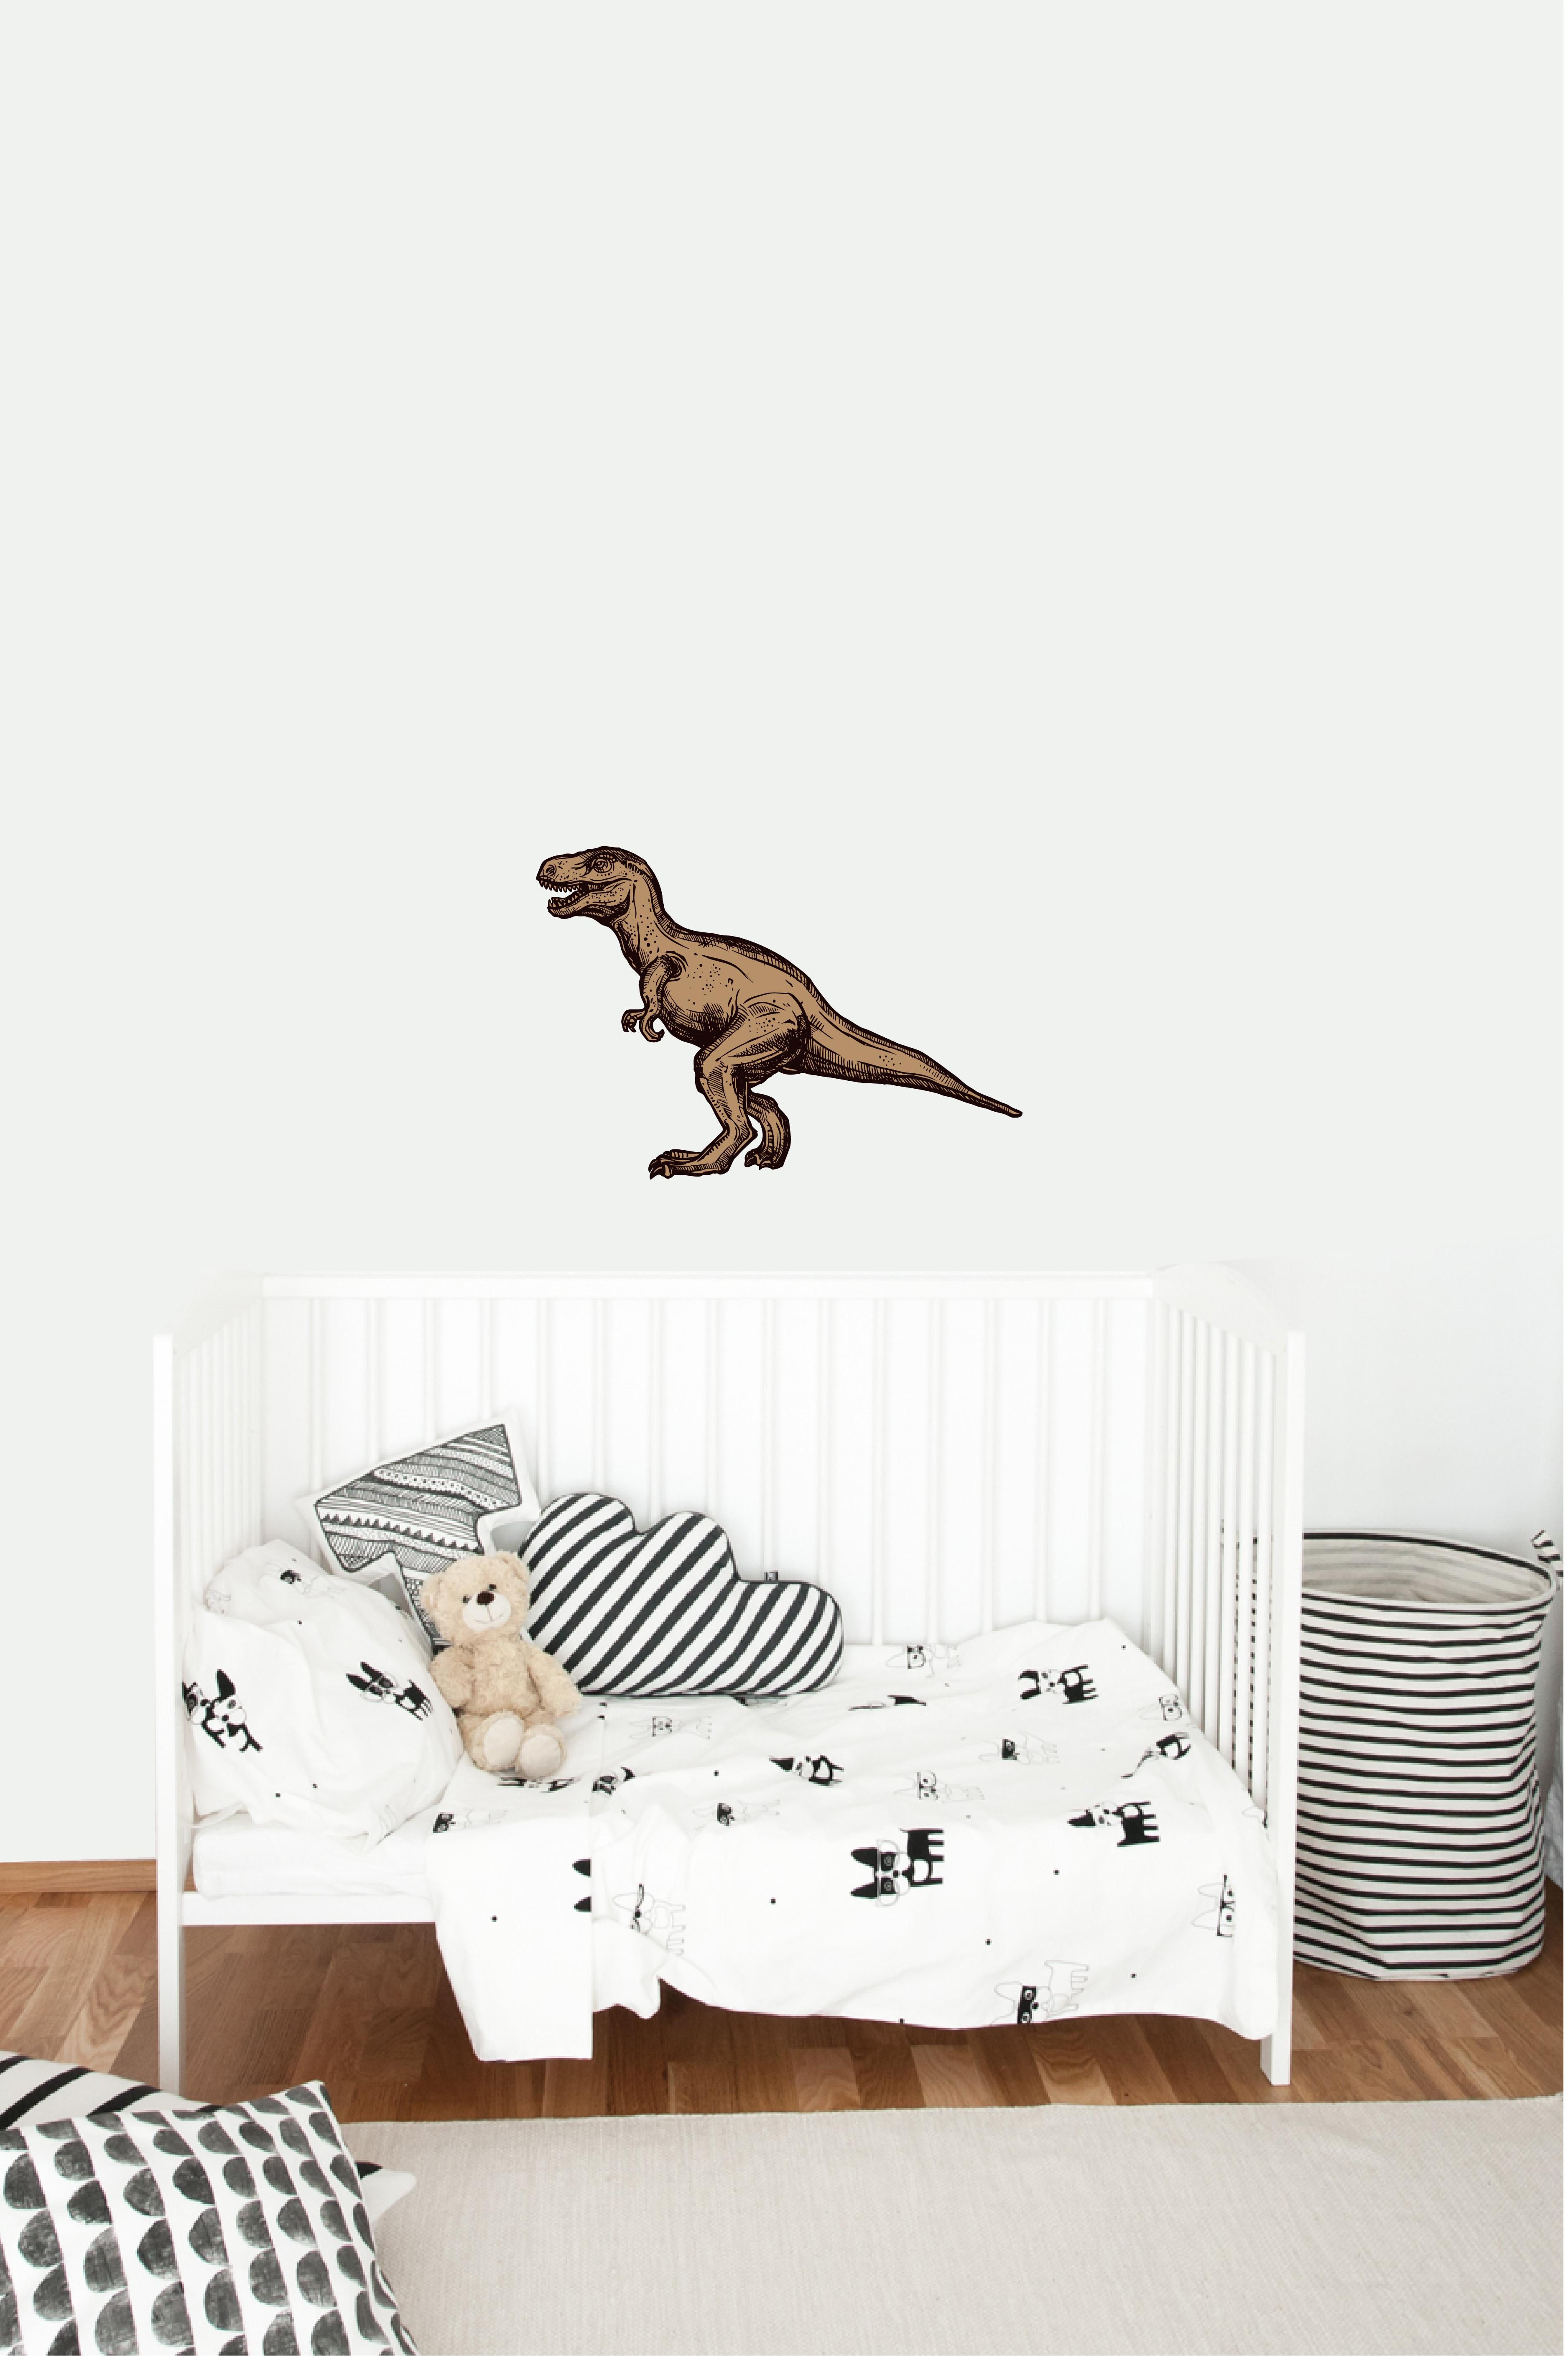 Muursticker tyrannosaurus